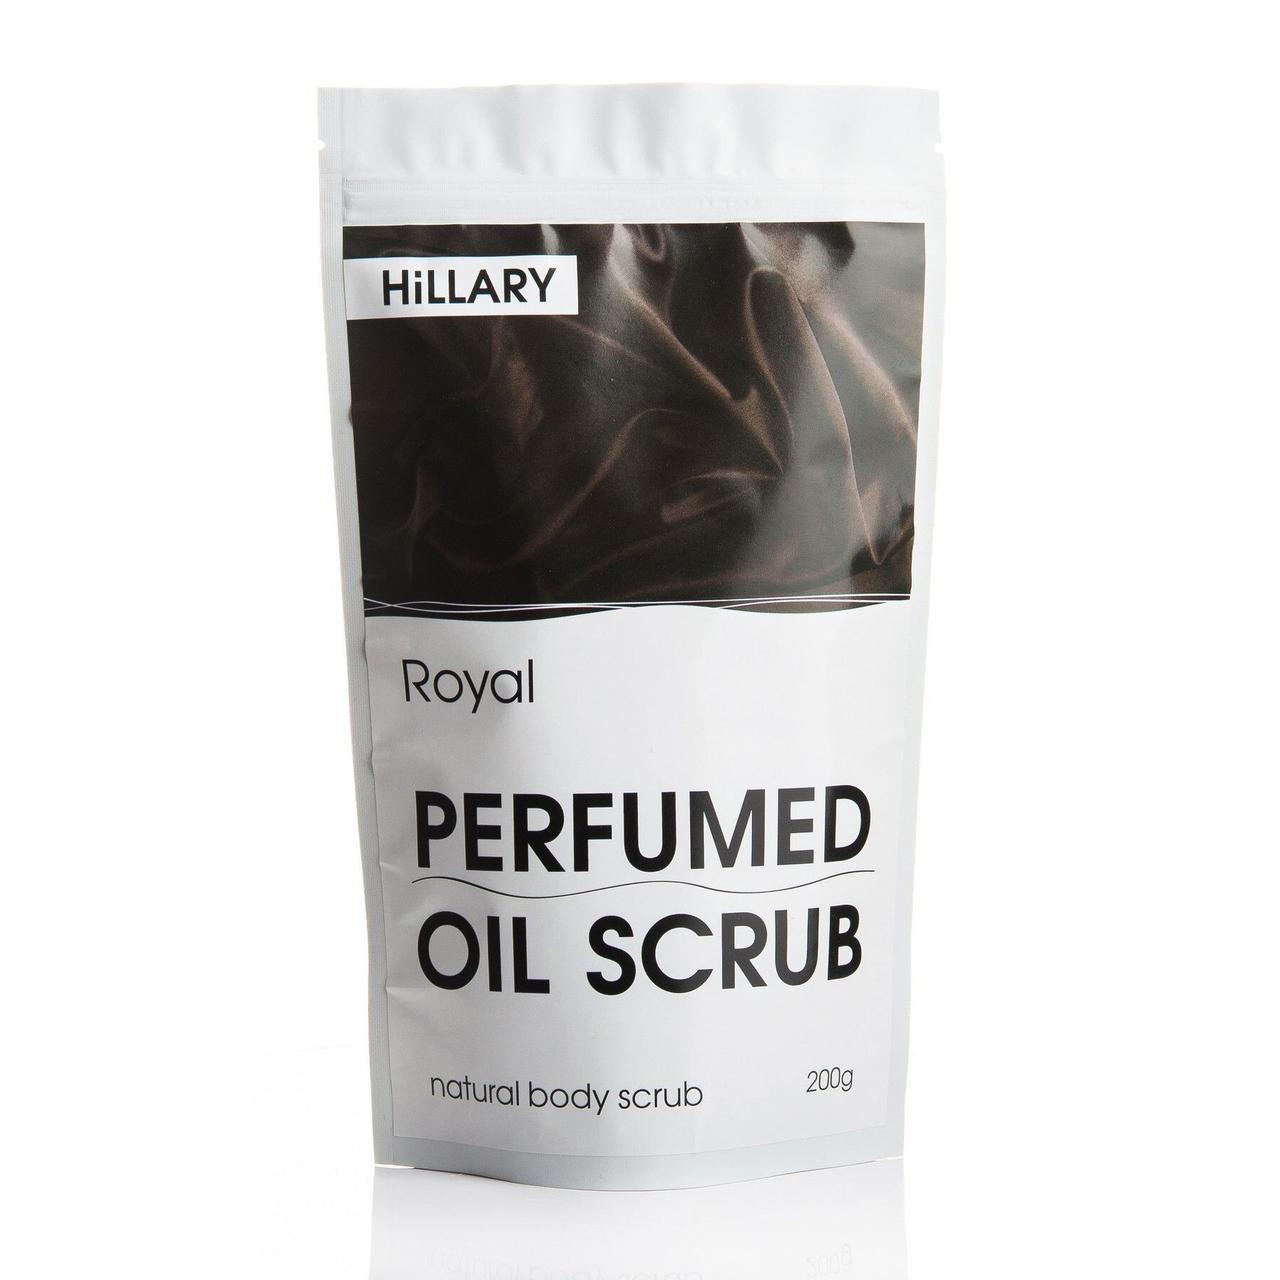 Скраб для тіла парфюмований Hillary Royal Perfumed Oil Scrub, 200 г